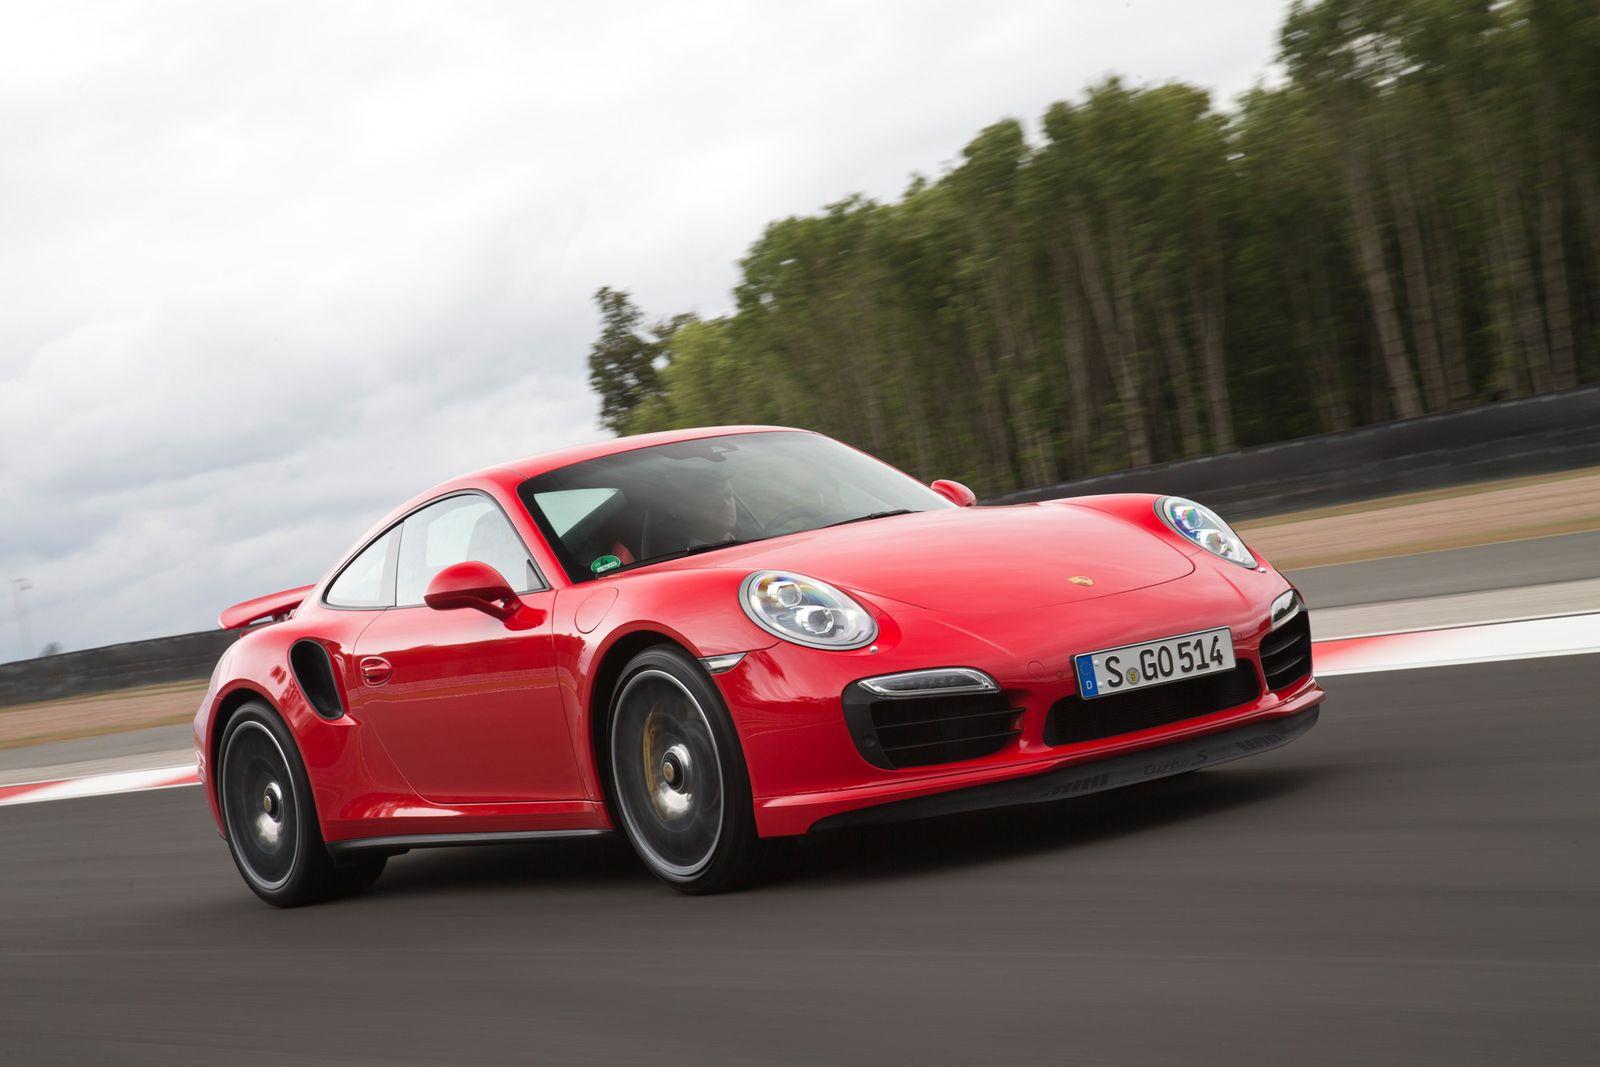 2013 / Porsche 911 Turbo S